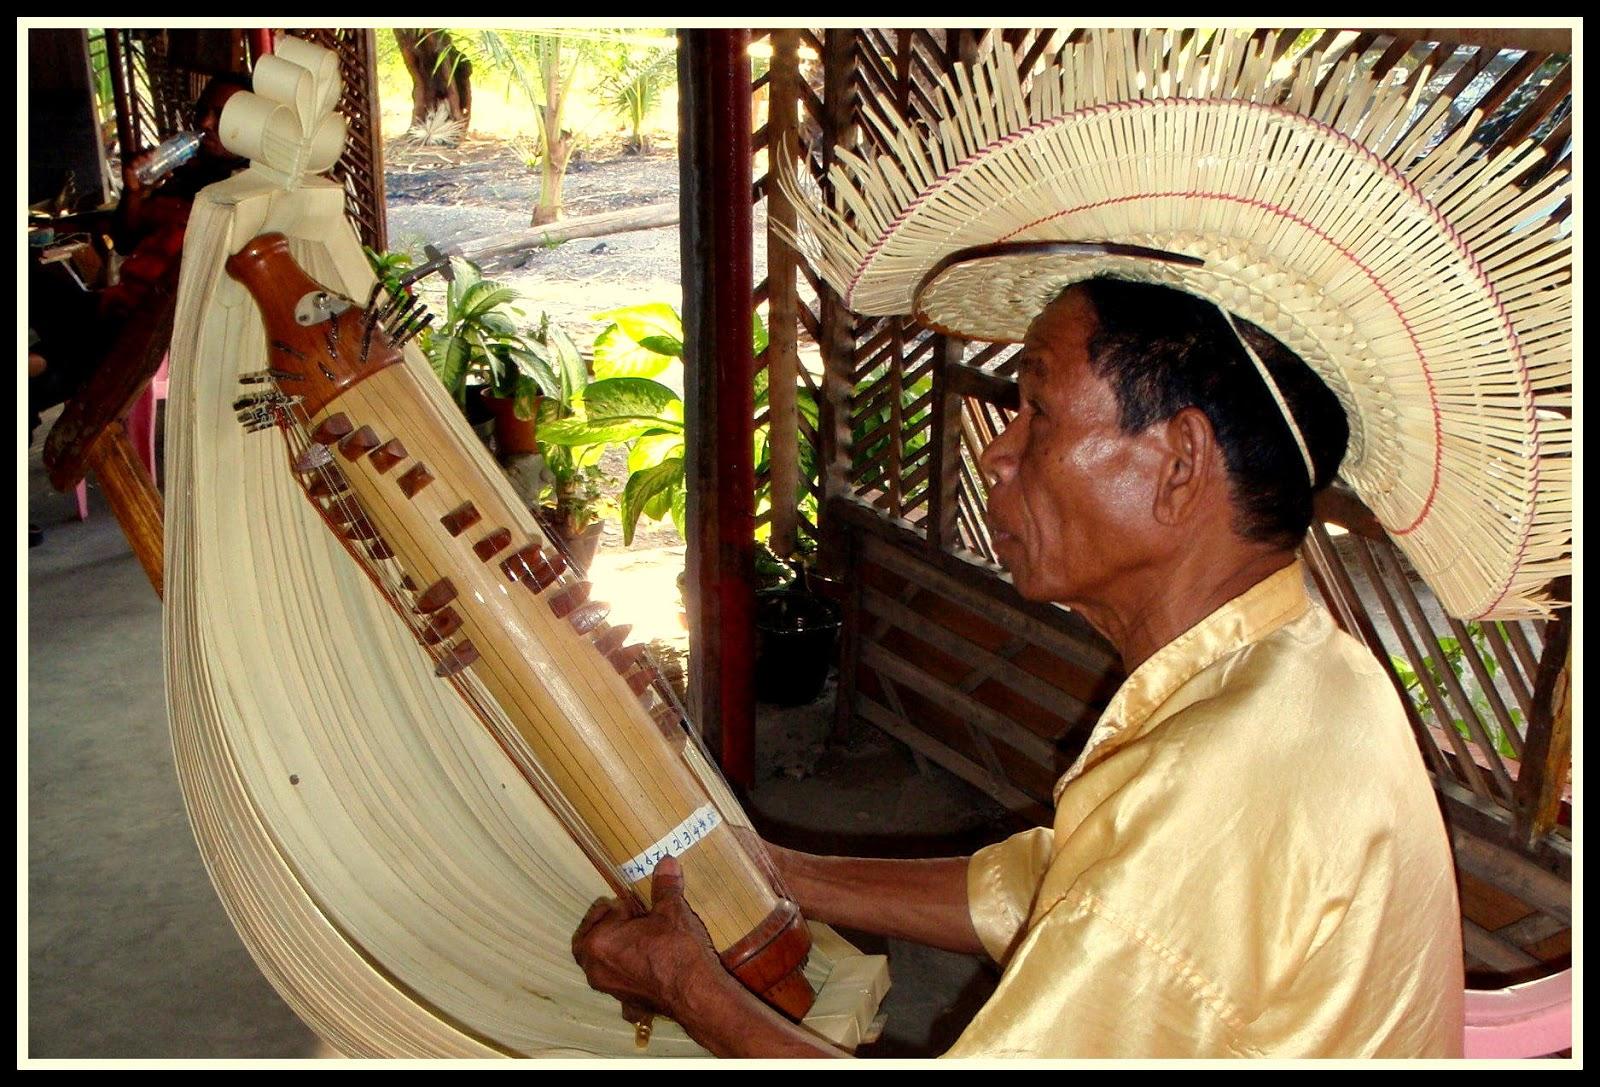 Sasando Alat Musik Tradisional Dari Rote Ndao, NTT ...